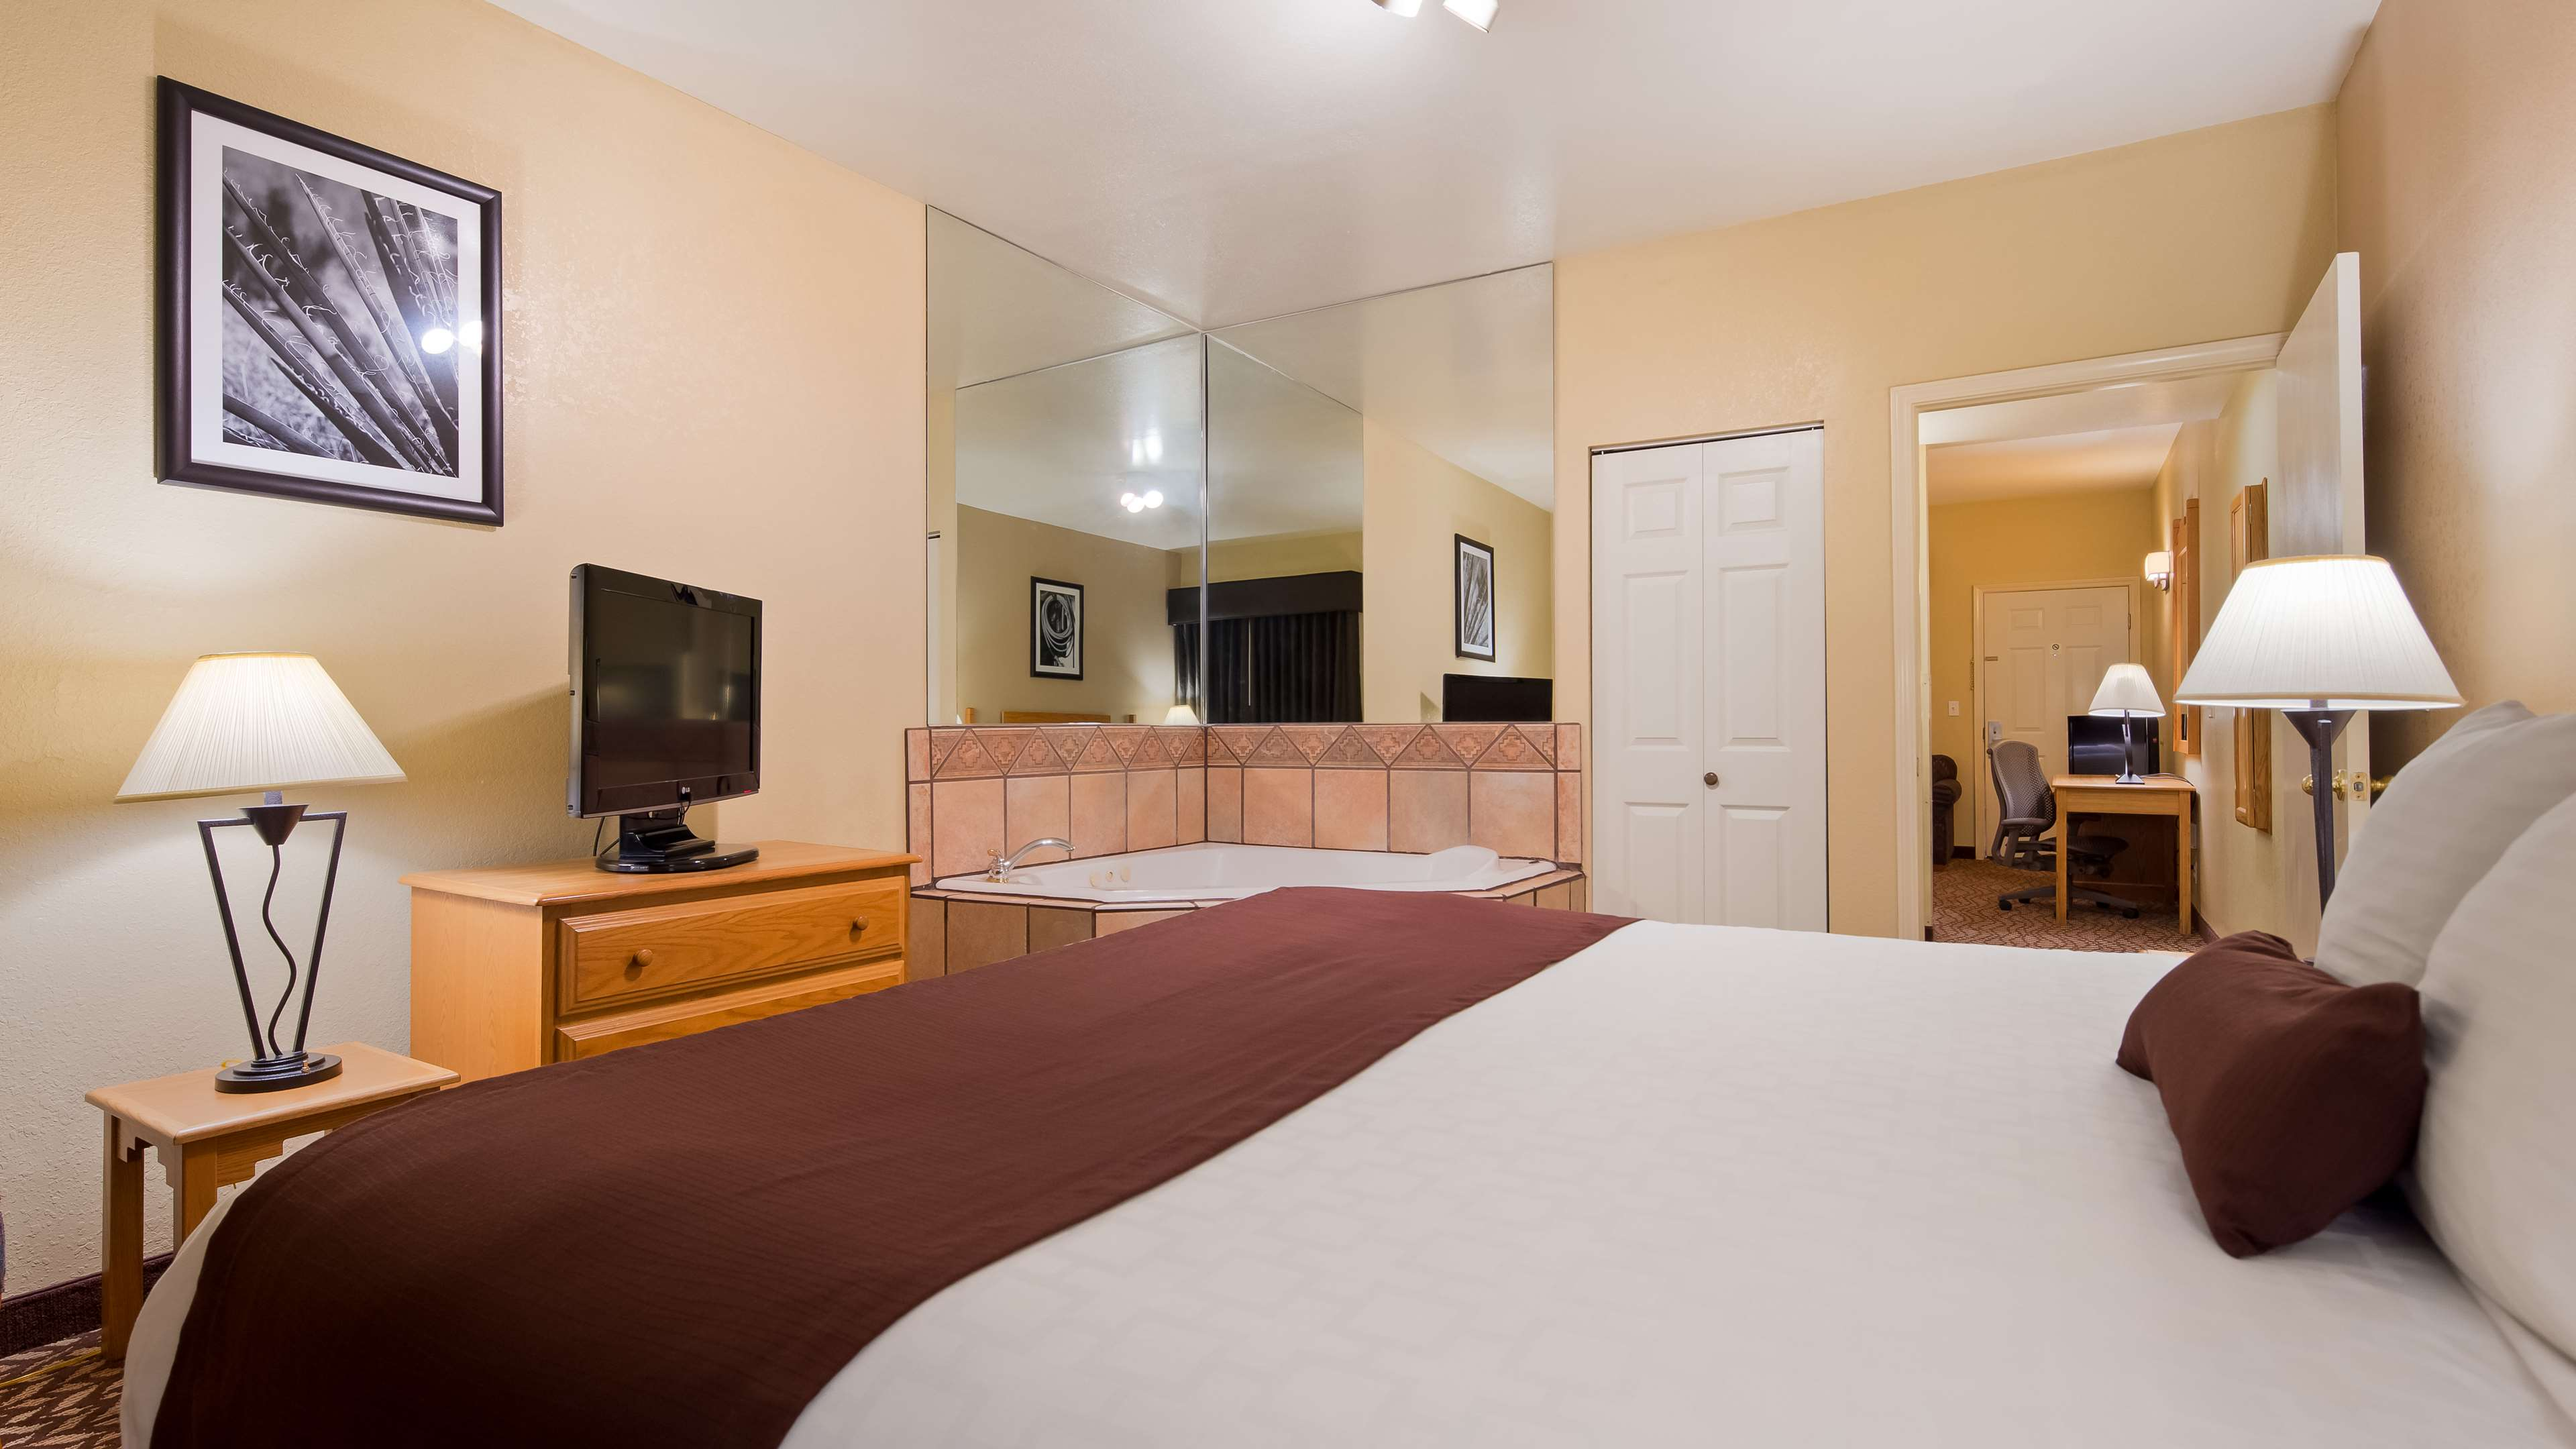 Best Western Turquoise Inn & Suites image 18